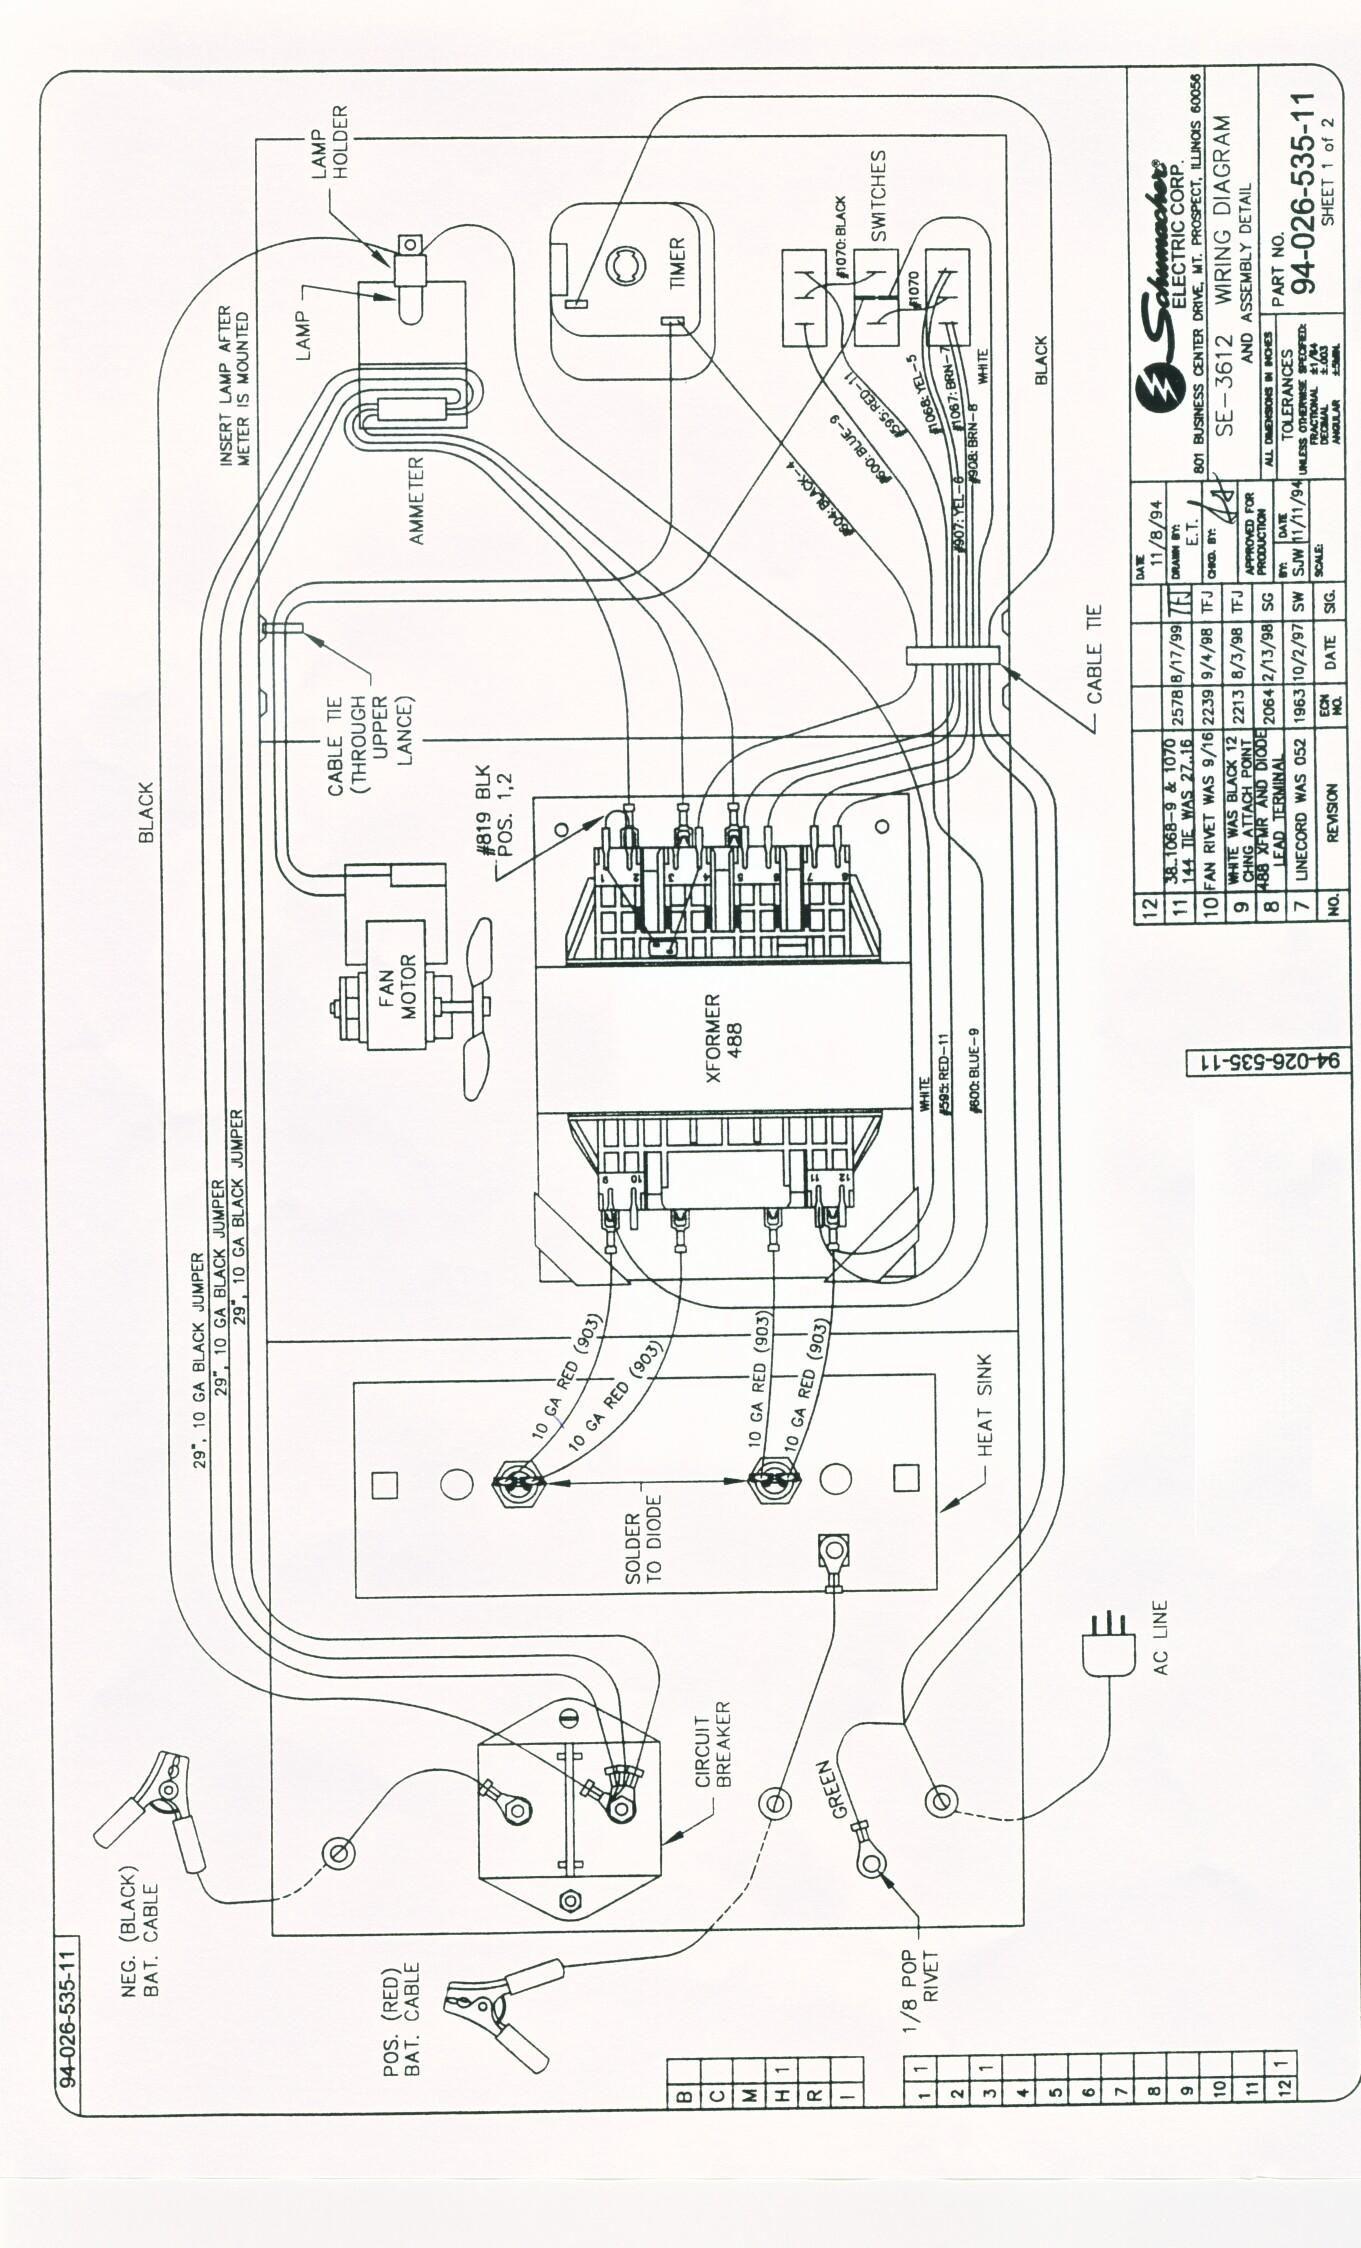 Pleasant Marine Charger Wiring Diagram Wiring Diagram Database Wiring Cloud Biosomenaidewilluminateatxorg